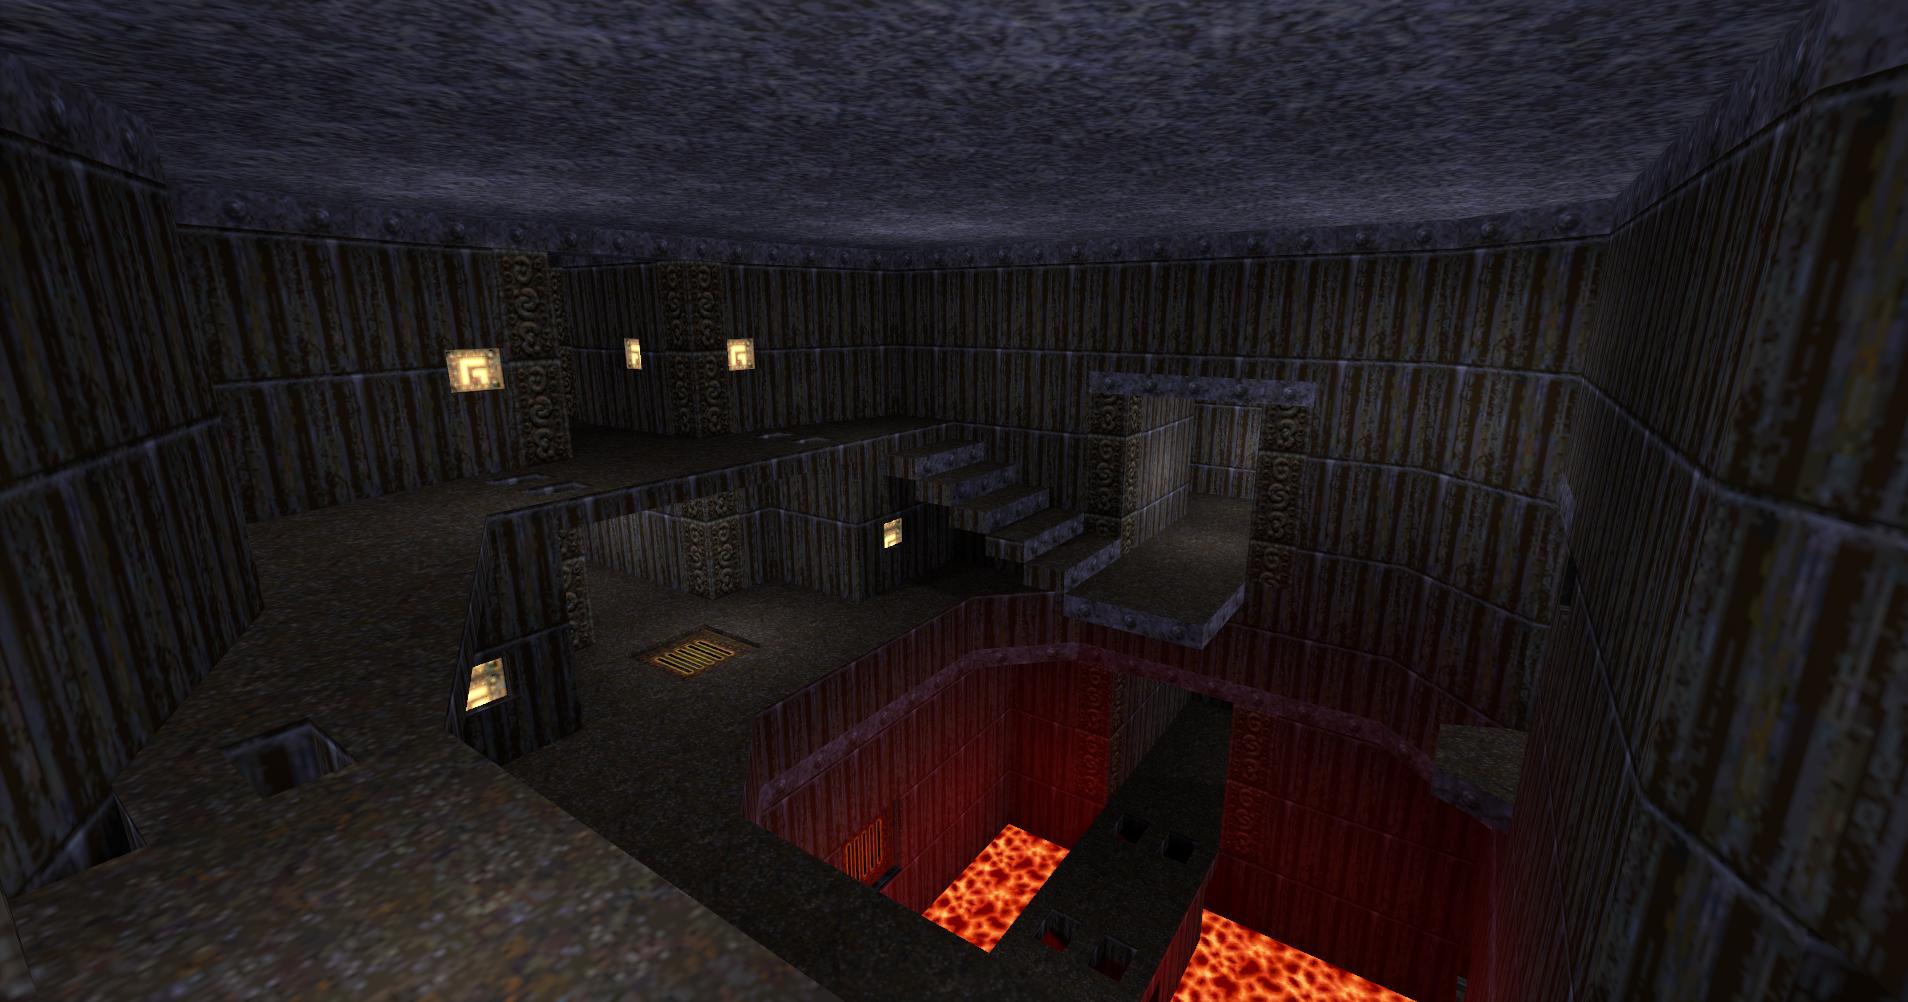 DM4 from Quake